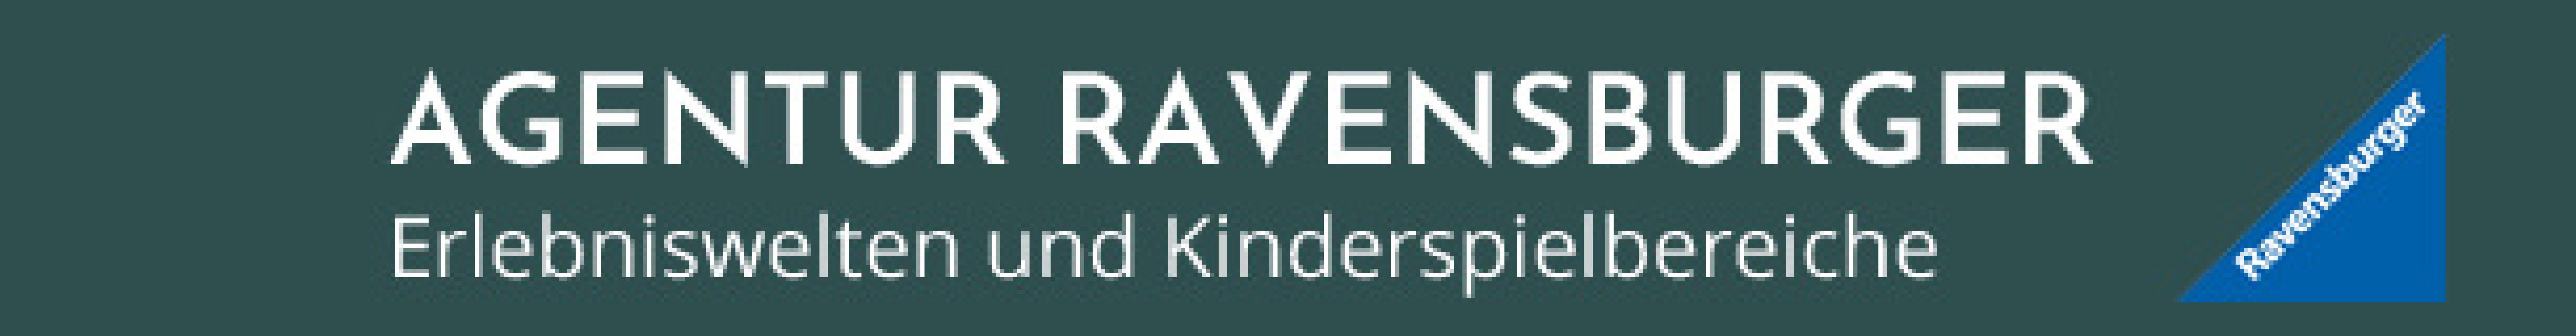 Agentur Ravensburger - Website Header Logo